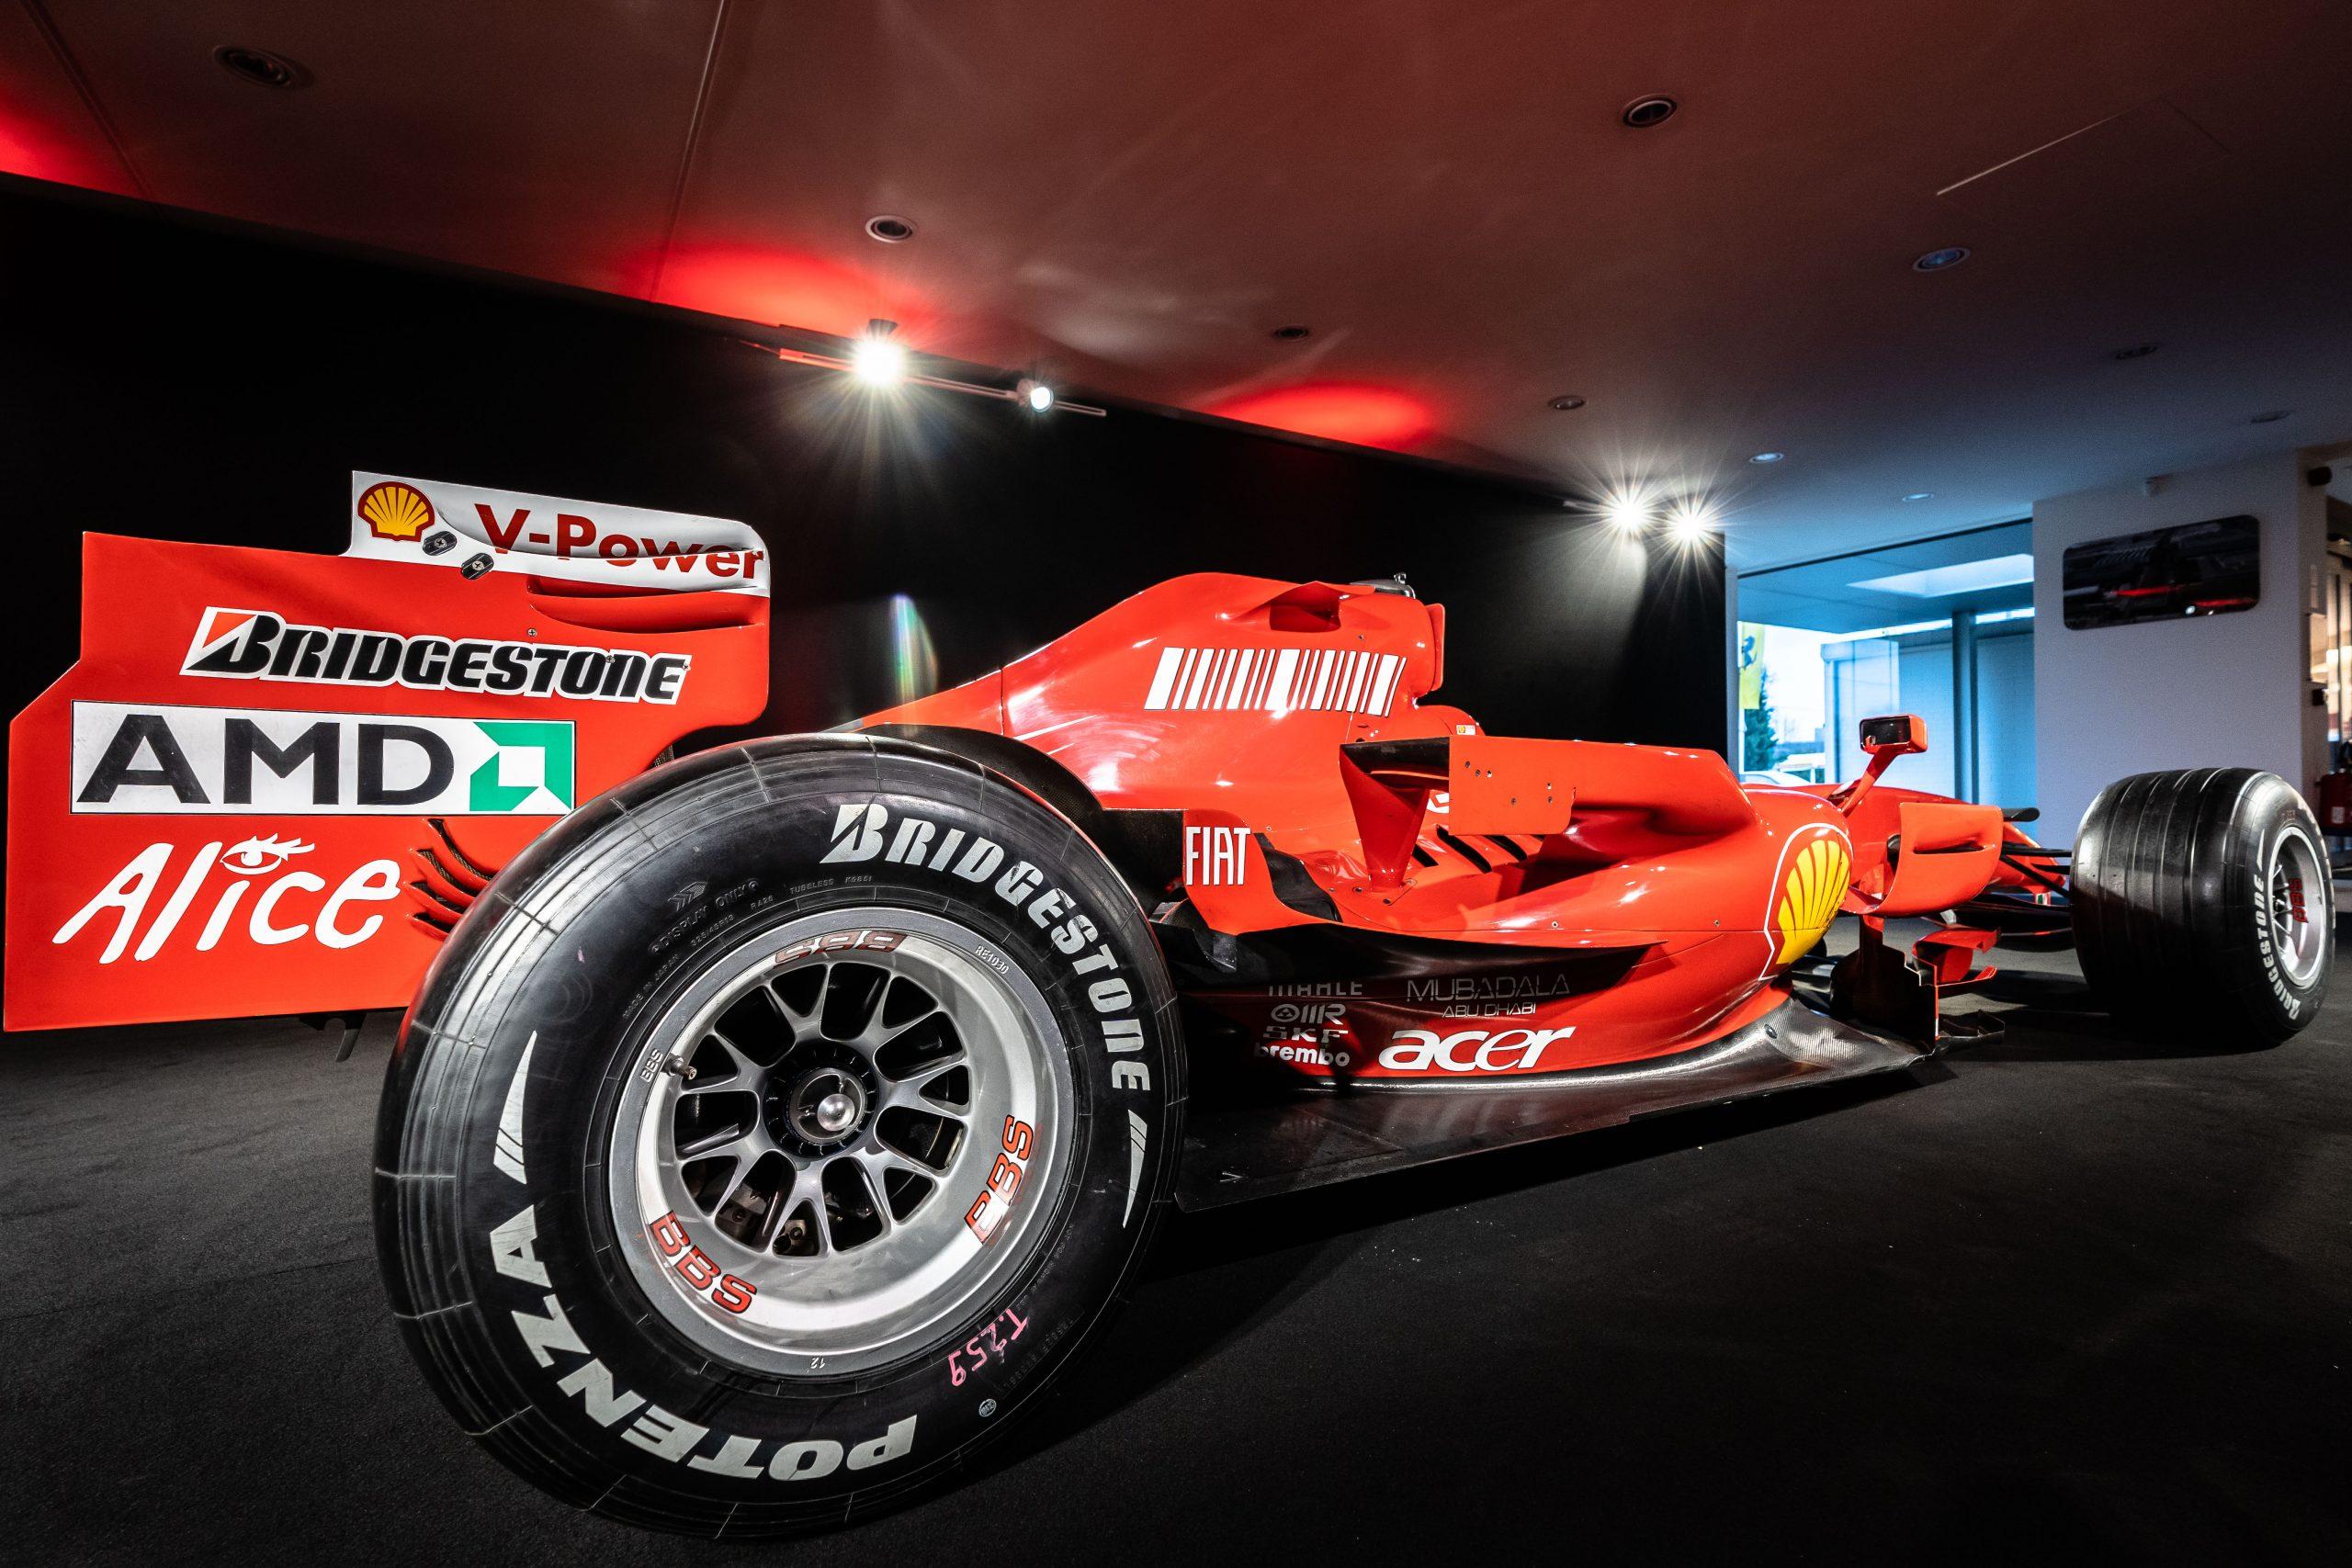 Ferrari F2007 - back right